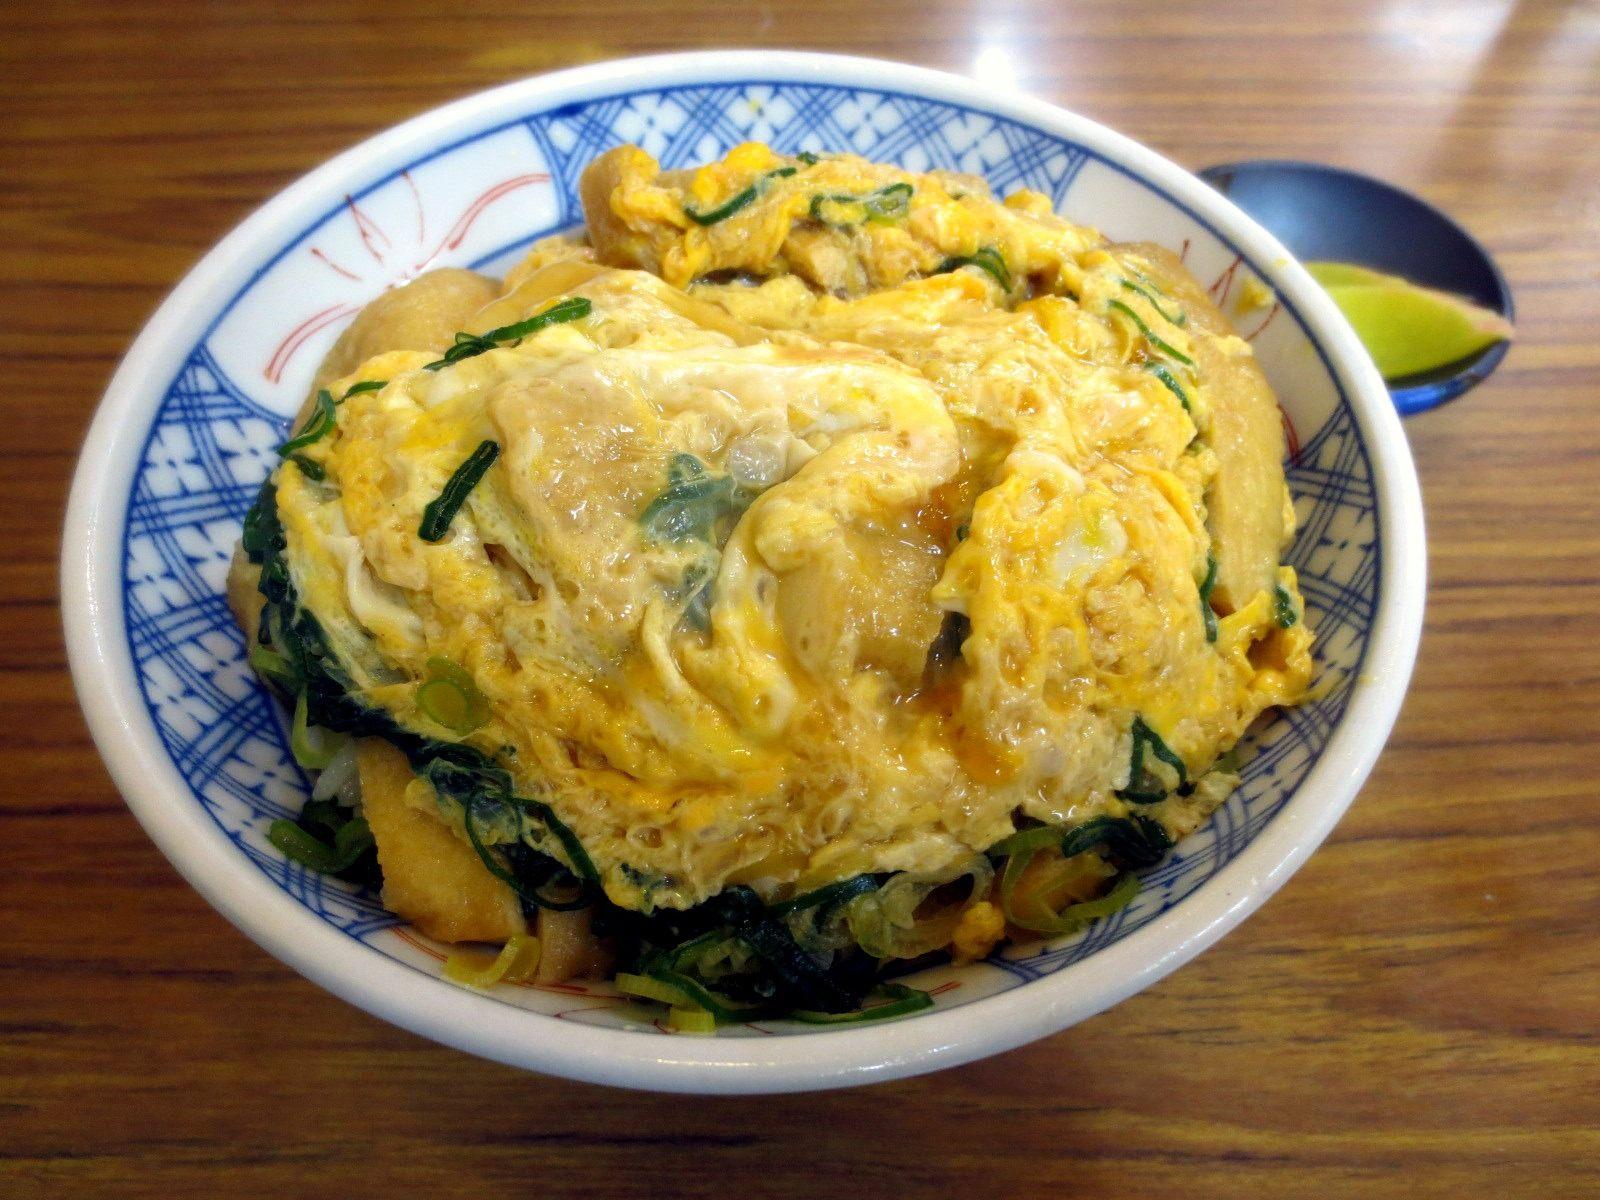 Fried Tofu and Egg Rice Bowl, Kitsune-don  ¥680